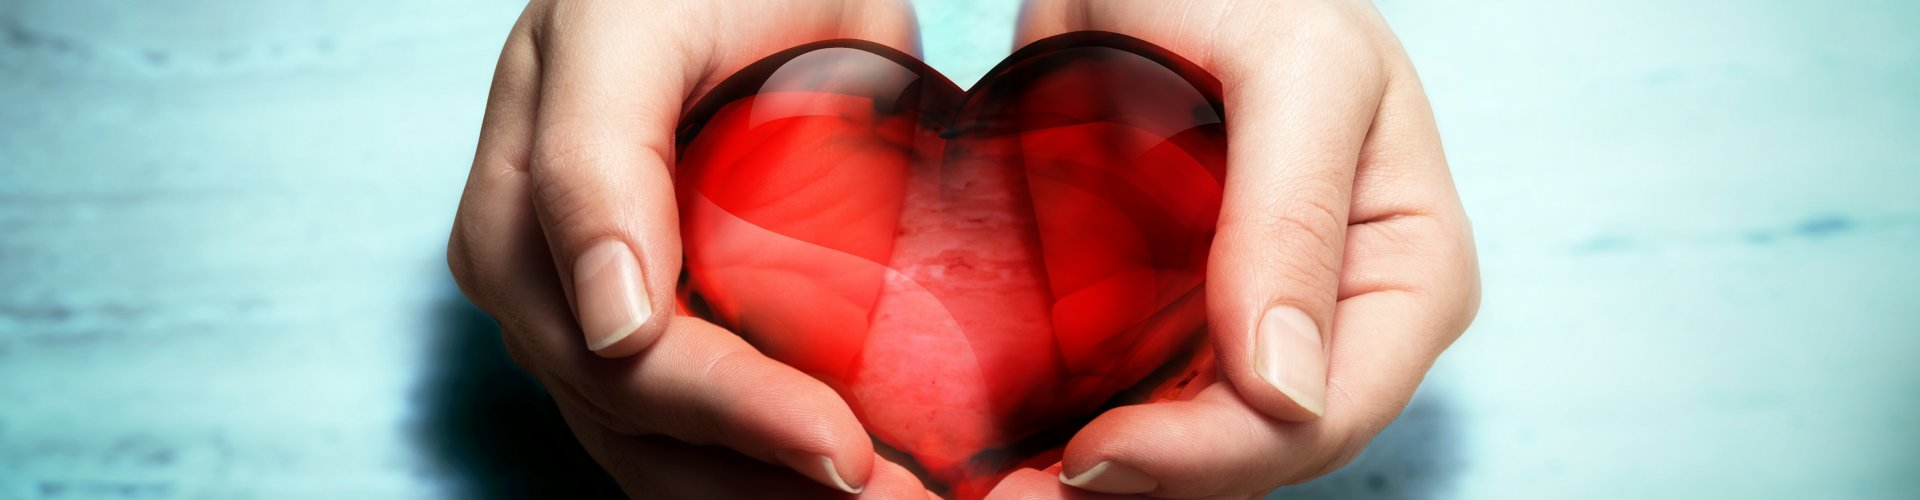 Zeg ja tegen kracht en liefde, zeg ja tegen je hart